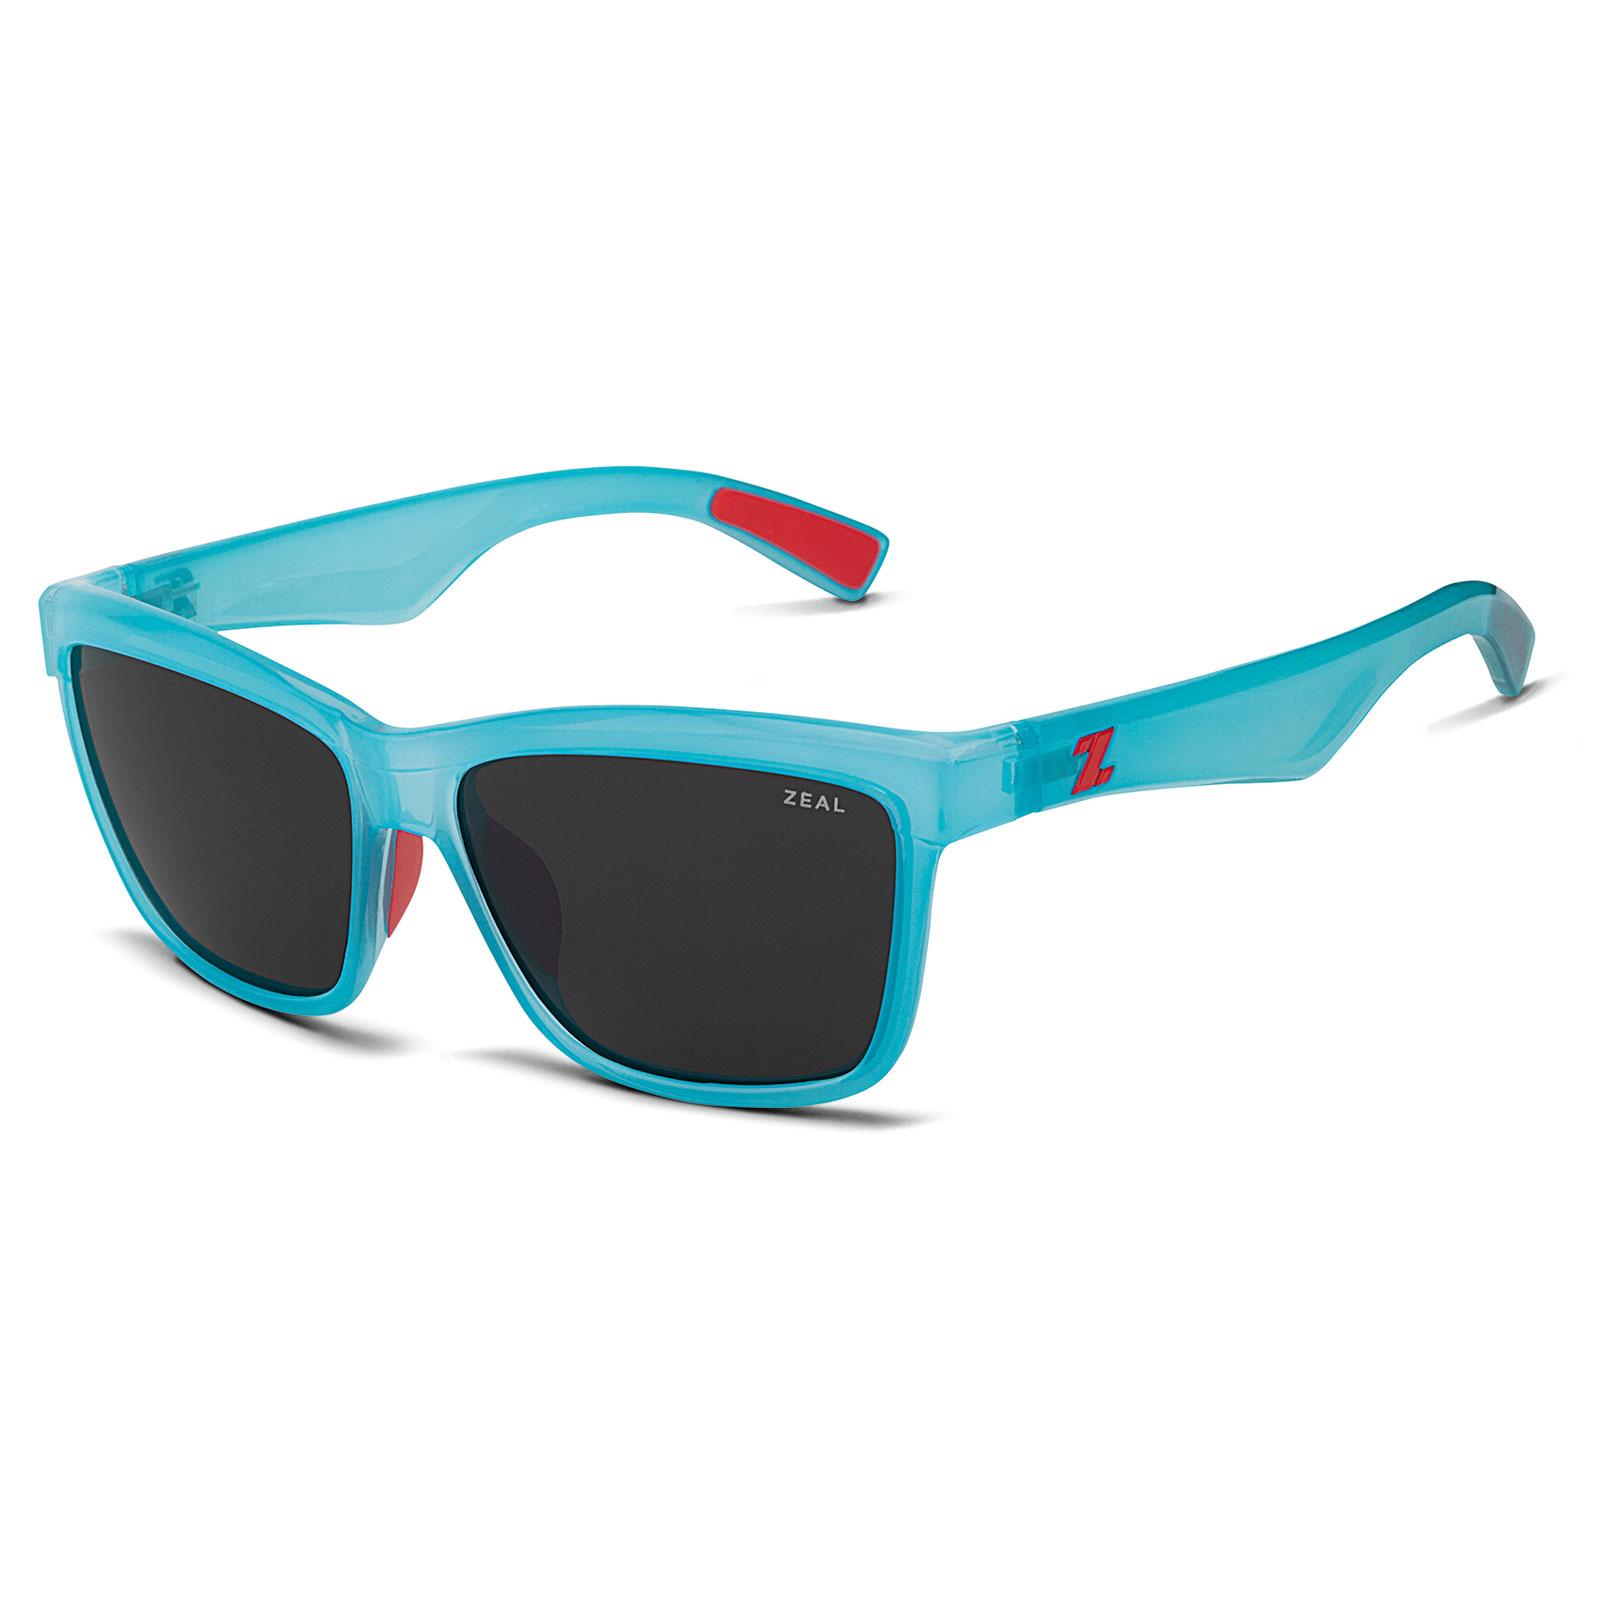 Sunglasses Uv Polarized Protection